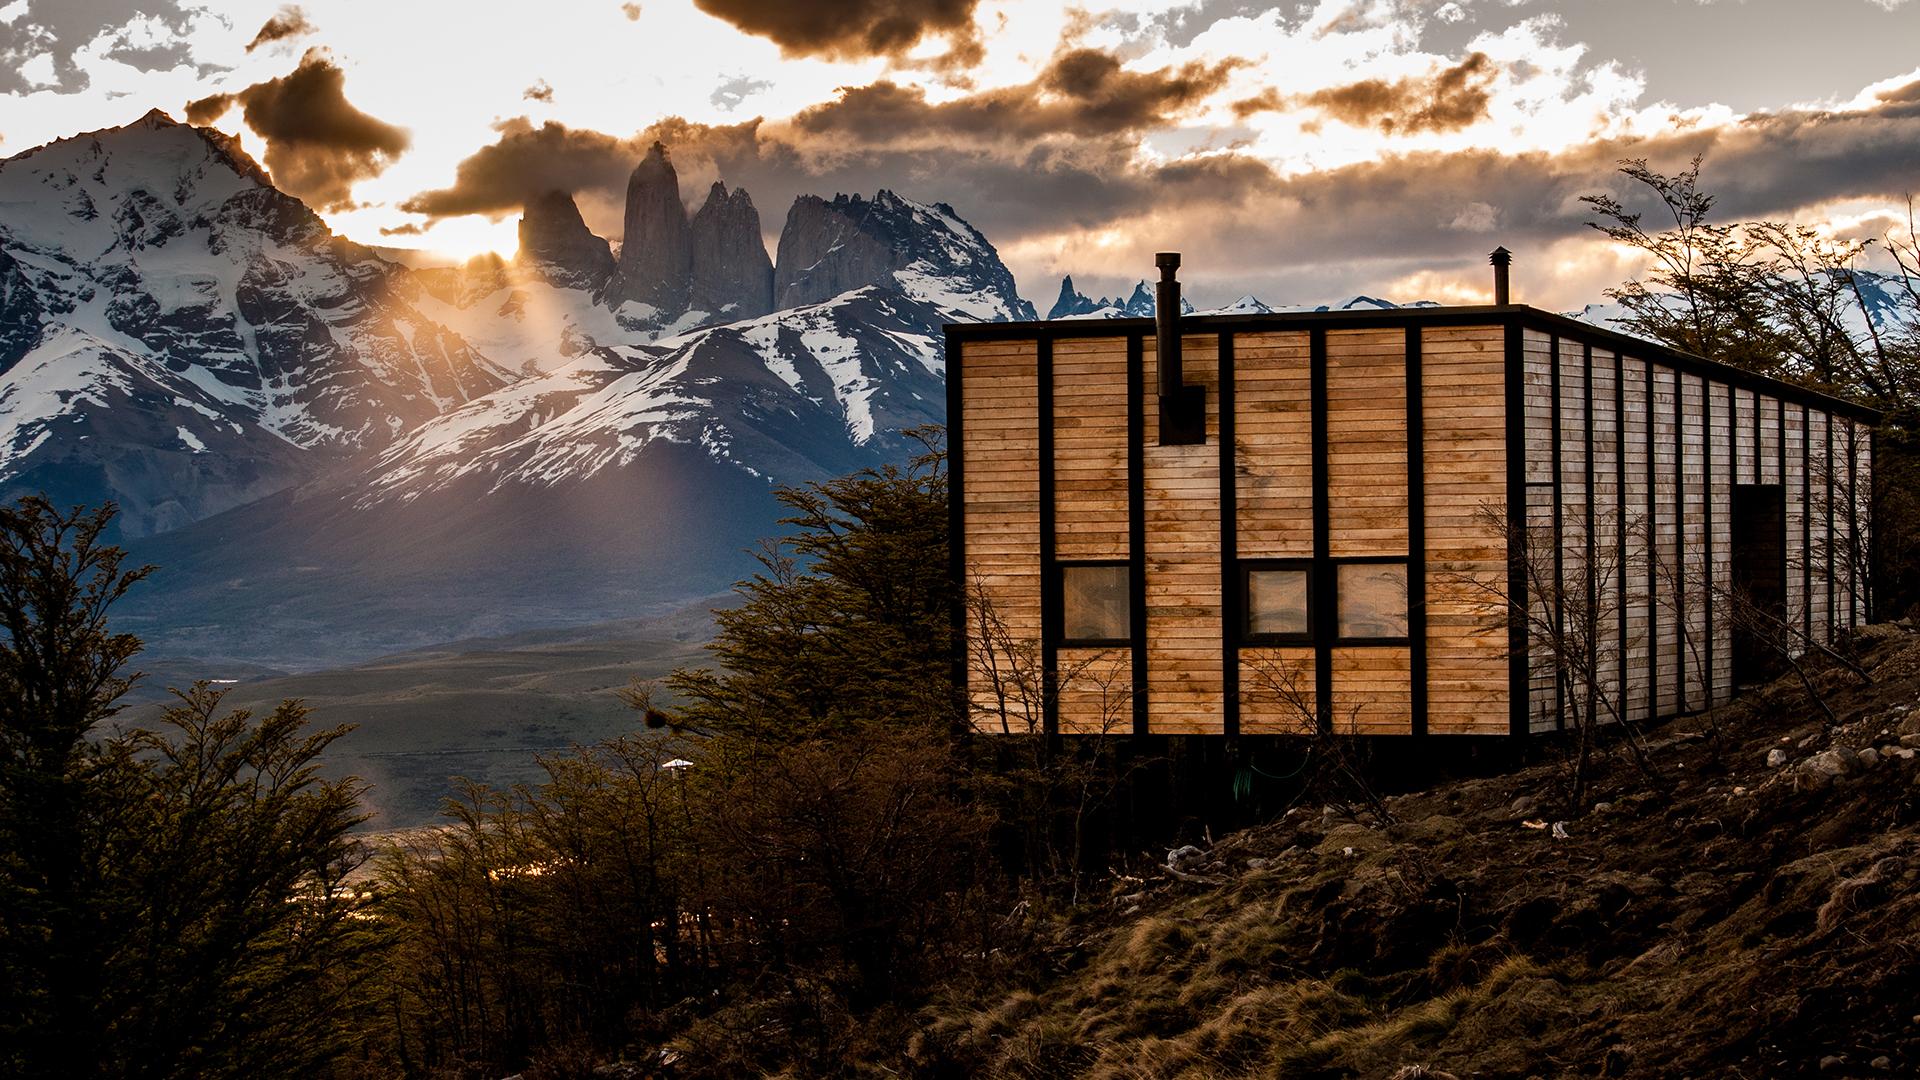 Villas-Exteriors-at-Awasi-Patagonia.jpg